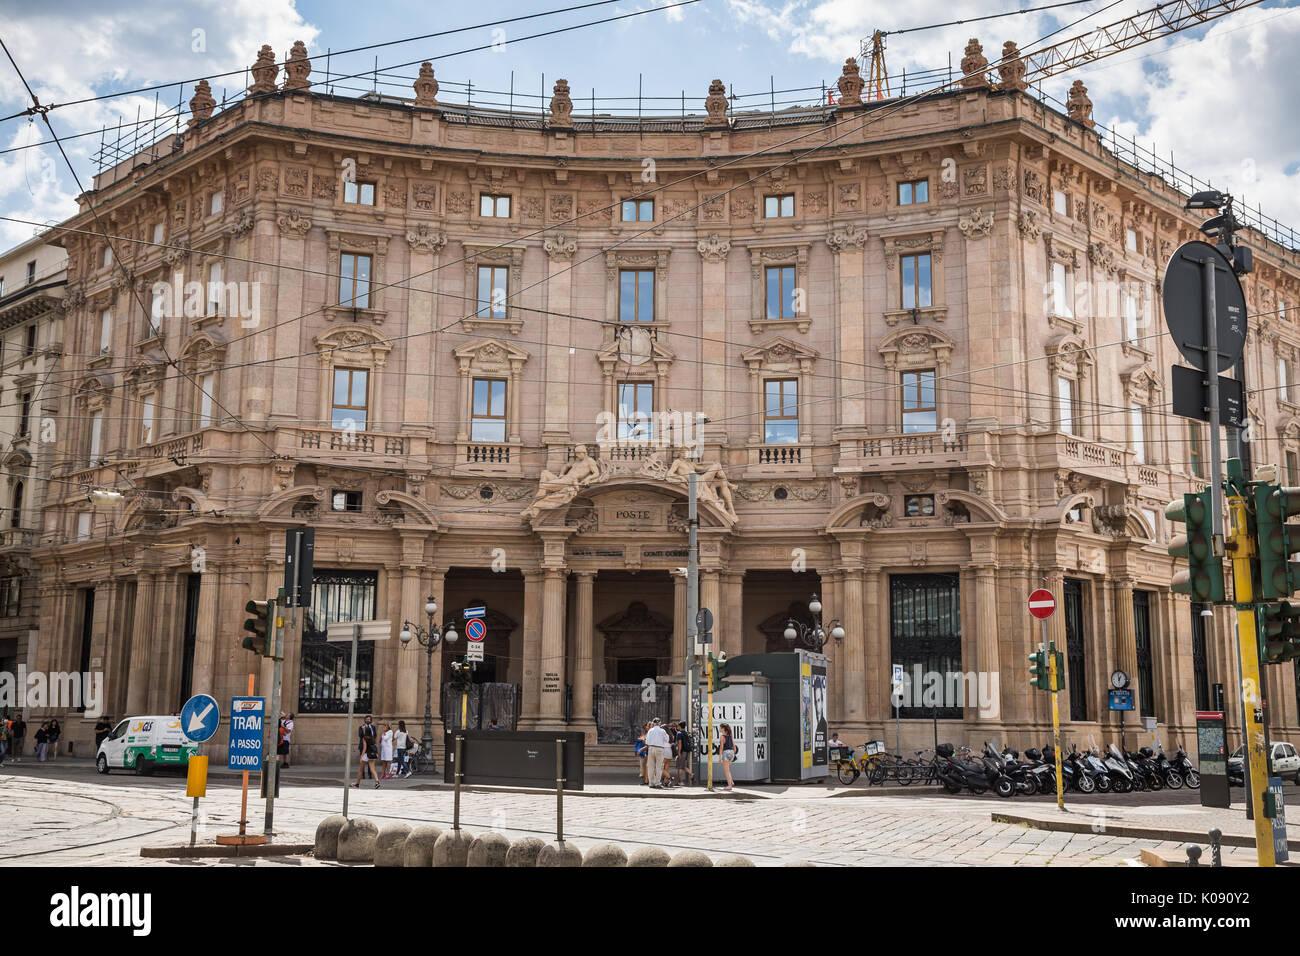 ex Palazzo delle Poste on Piazza Cordusio, Milan, Italy - Stock Image